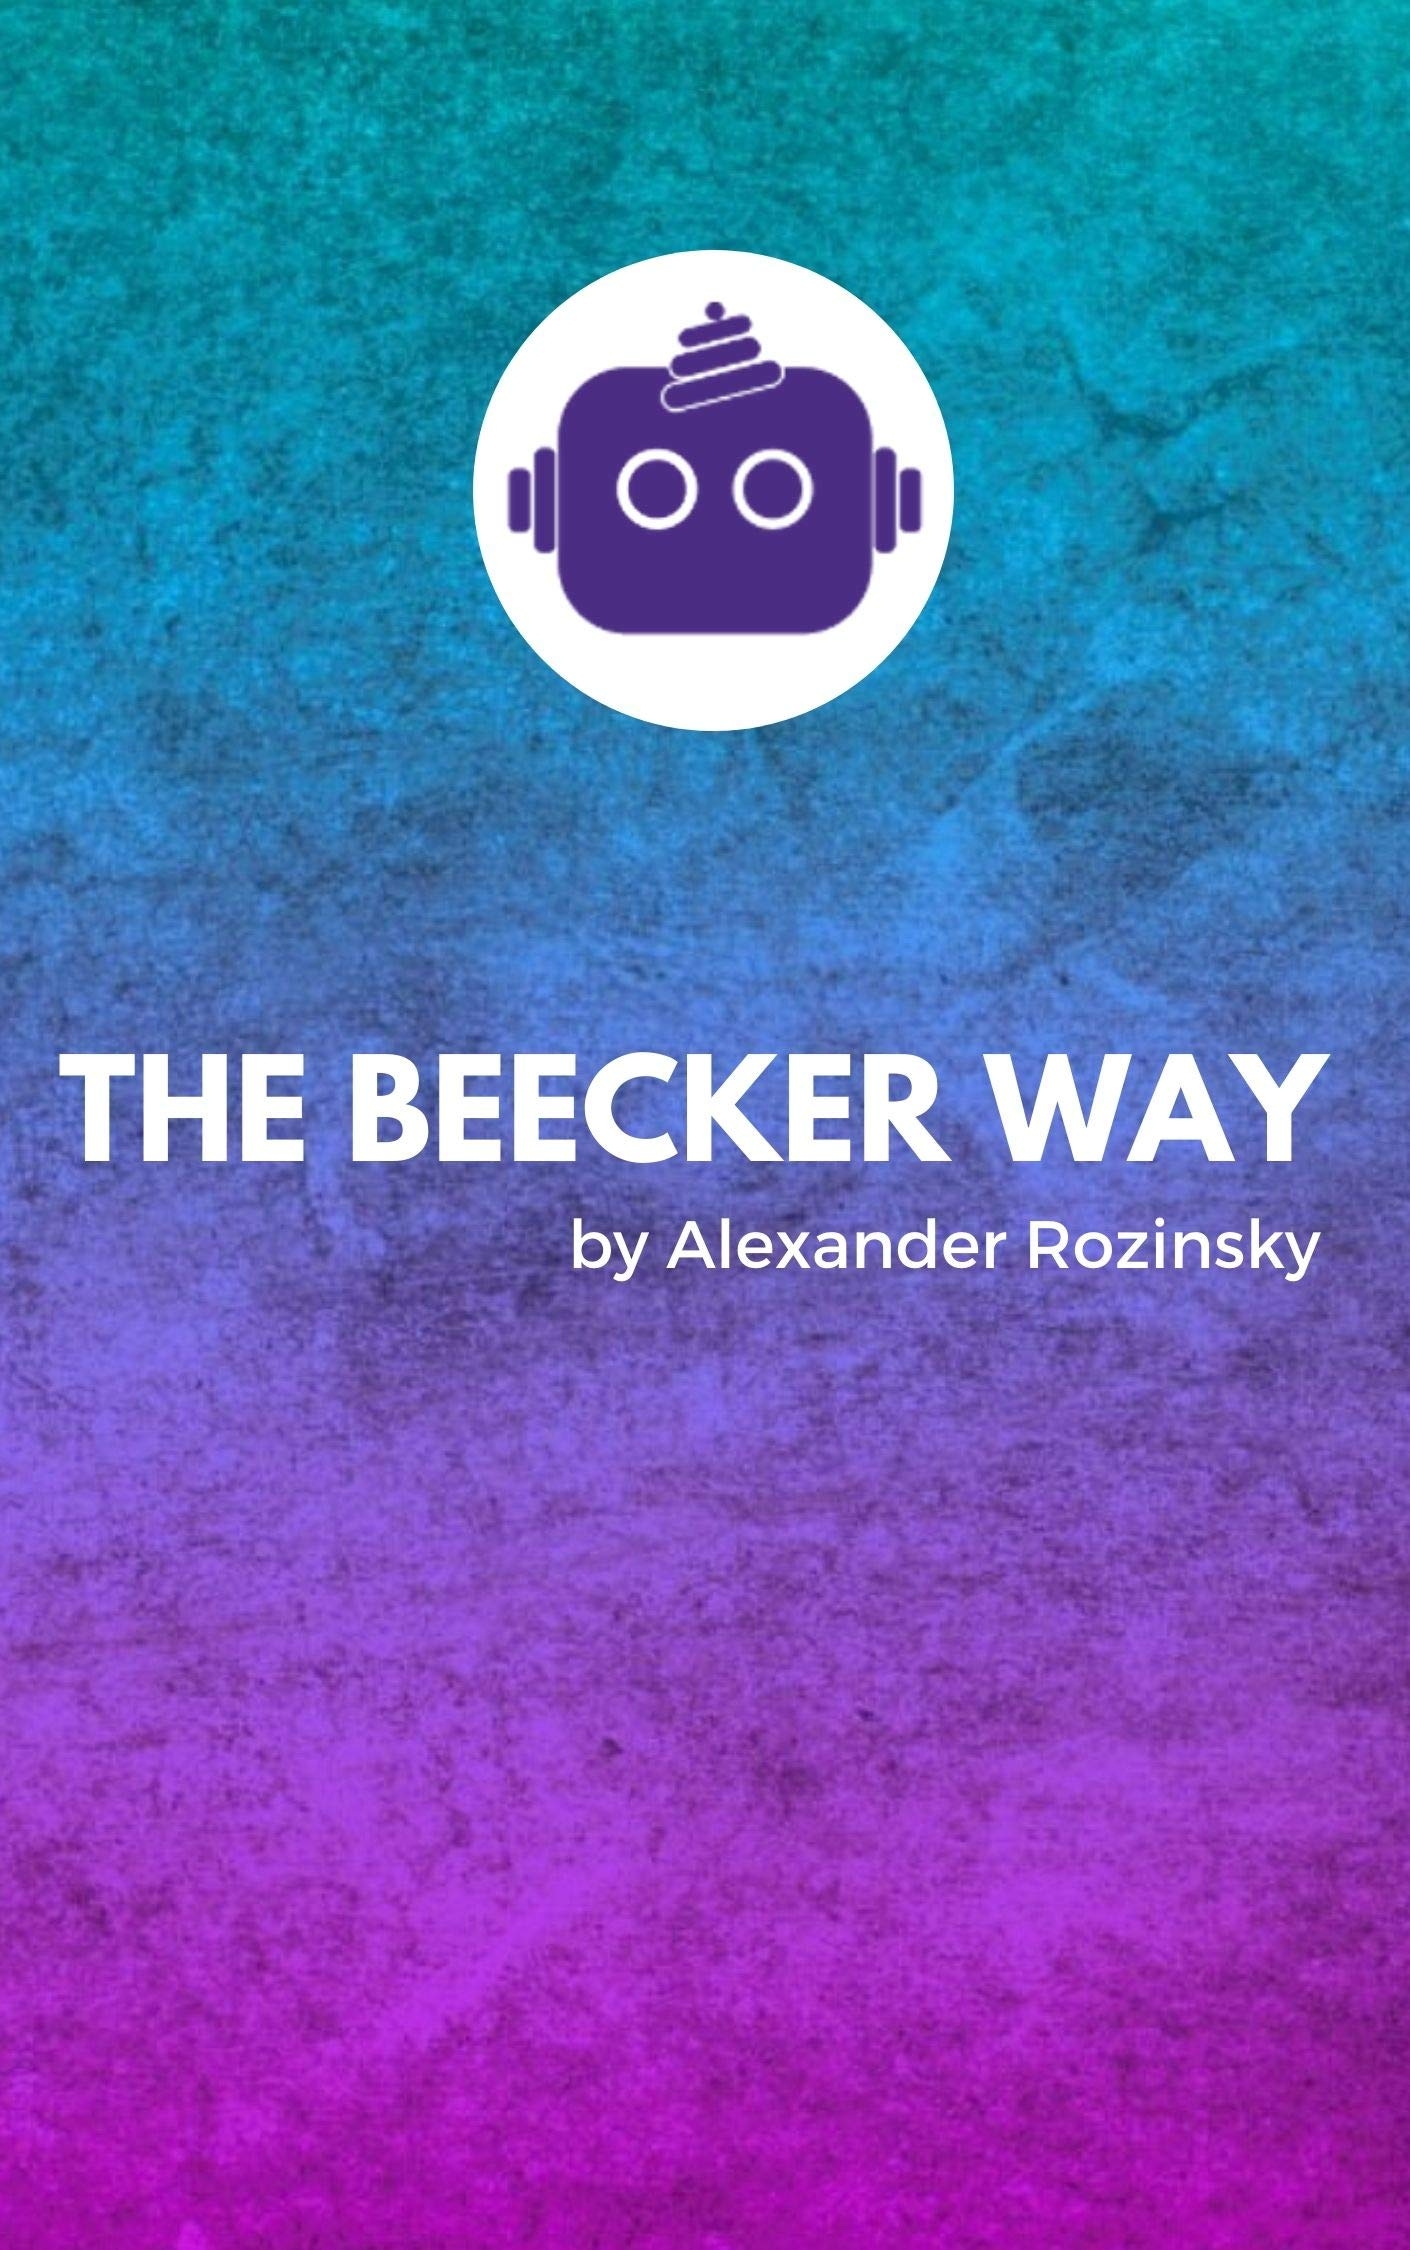 The Beecker Way